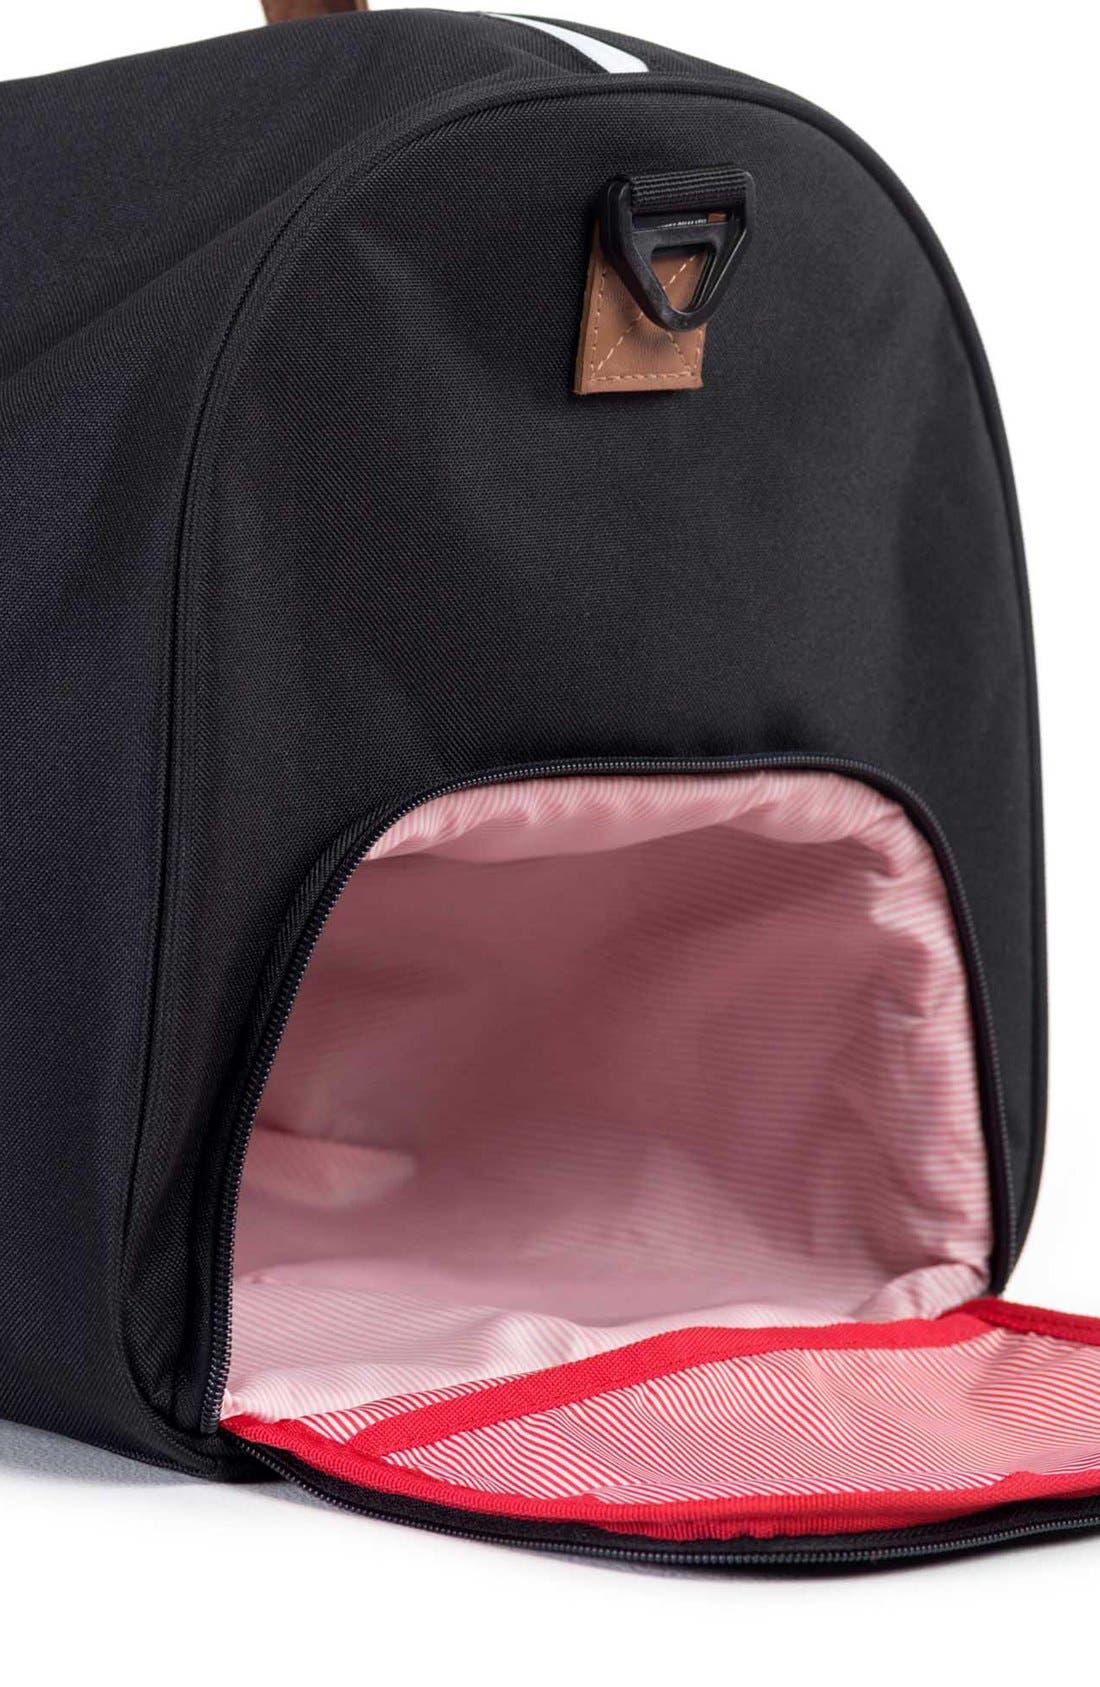 'Novel' Duffel Bag,                             Alternate thumbnail 12, color,                             BLACK/ TAN